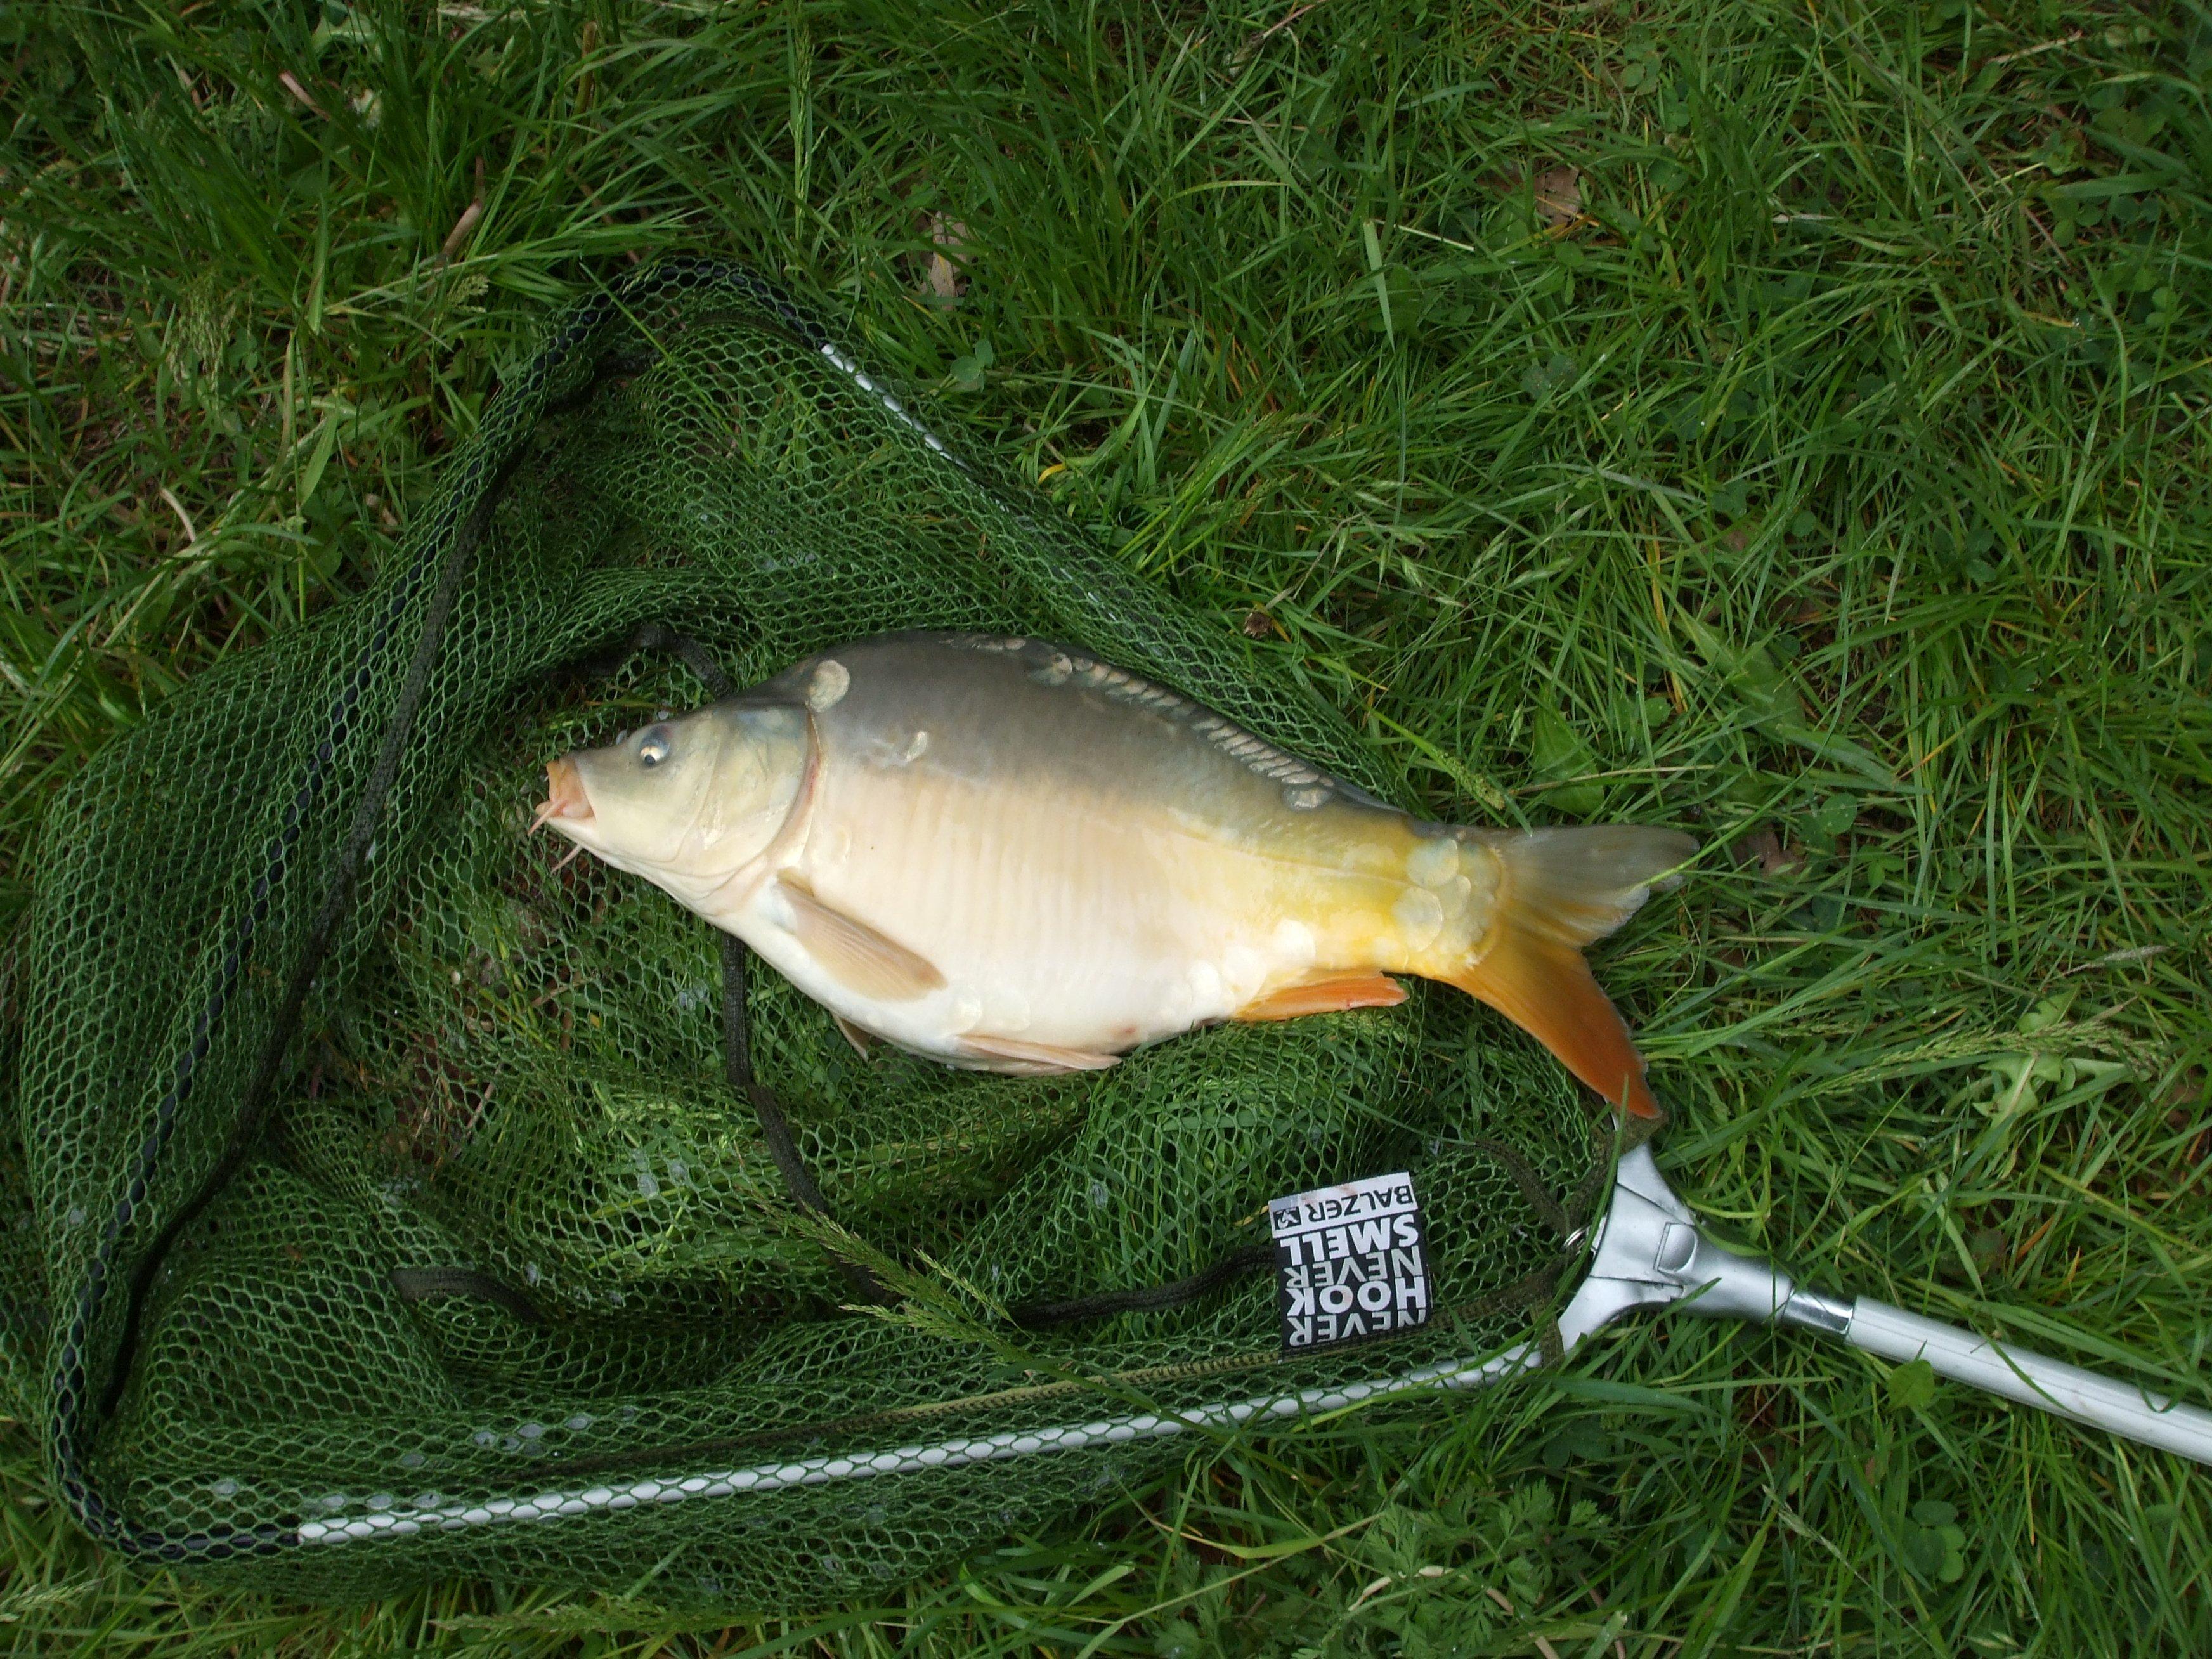 Free Images : grass, animal, food, fishing, perch, fish, fauna, bass ...